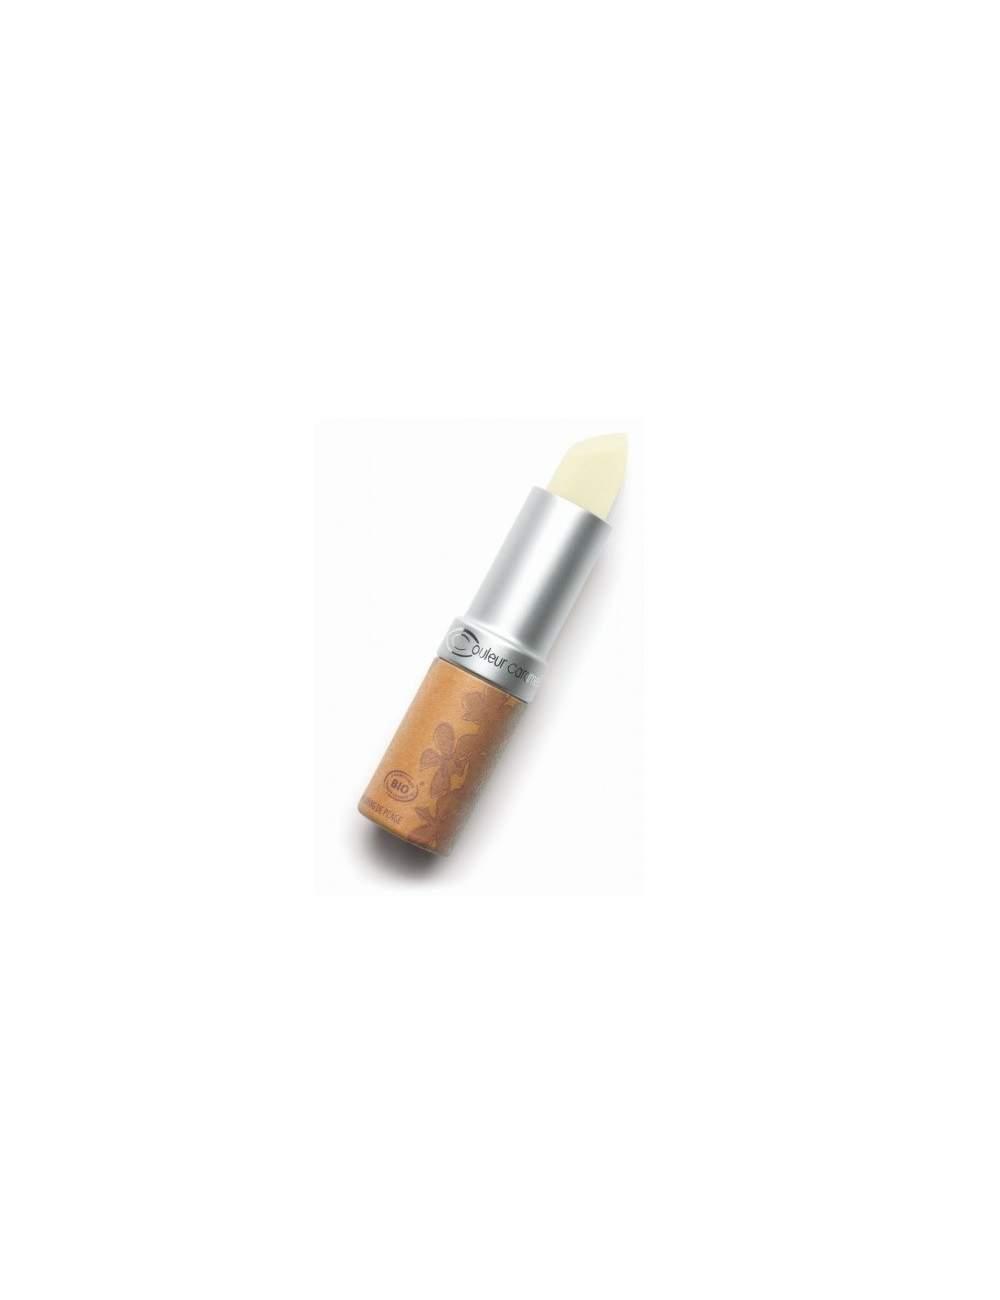 Bálsamo Labial Bio 229 Transparente. Couleur Caramel